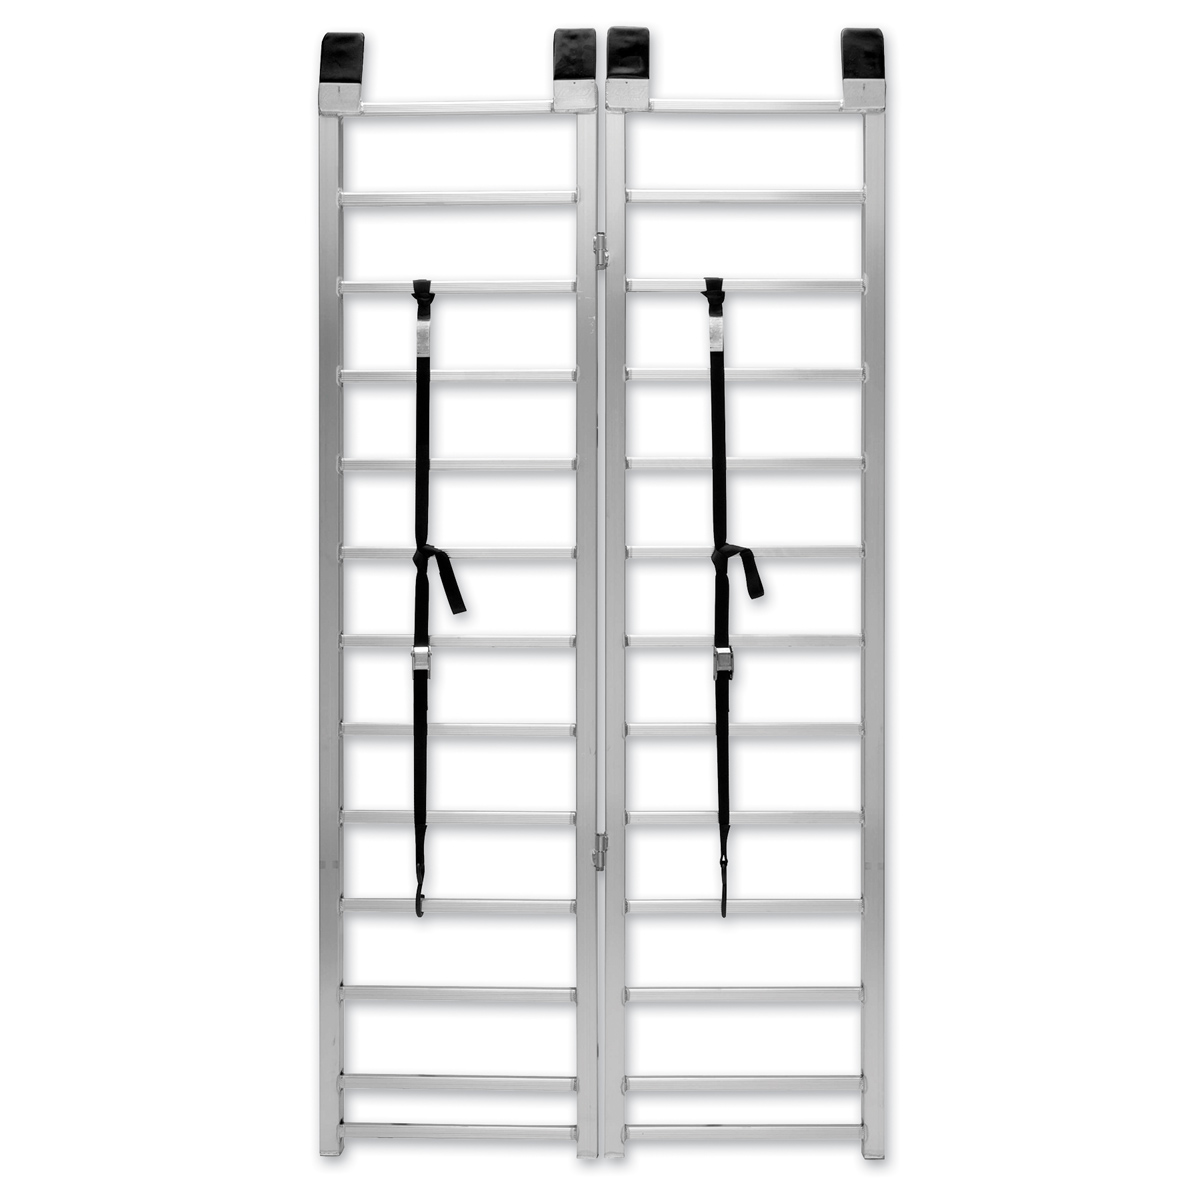 Quadboss Bi-Fold Ramp 71″ x 41″ - 1,500 Pound Capacity